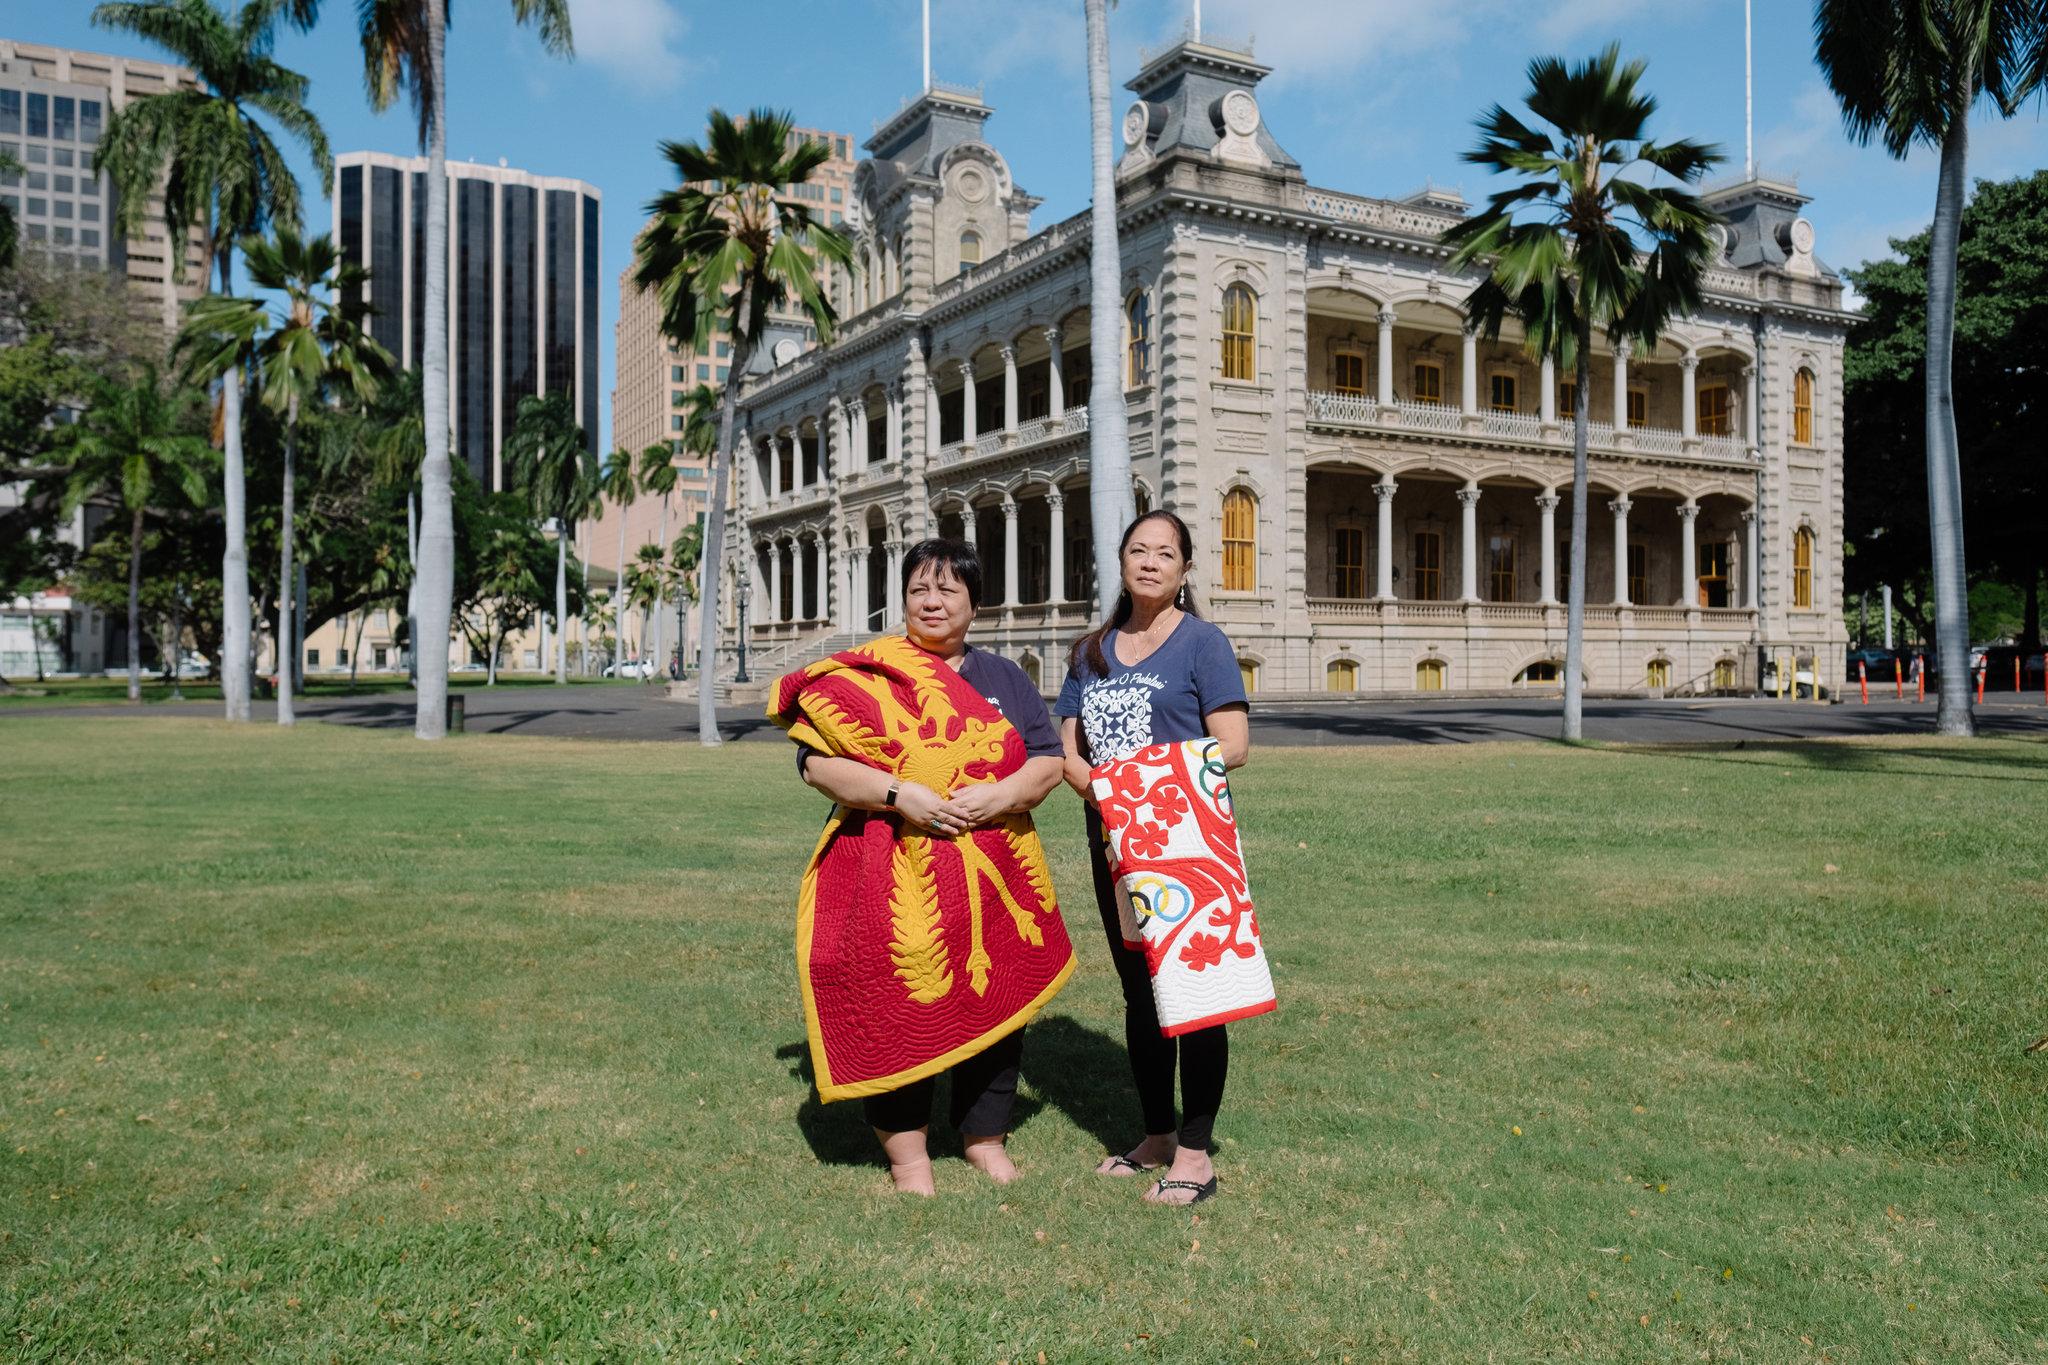 Quilters Cissy Serrao and Patricia Gorelangton outside Honolulu's Iolani Palace / Photo: Josiah Patterson.